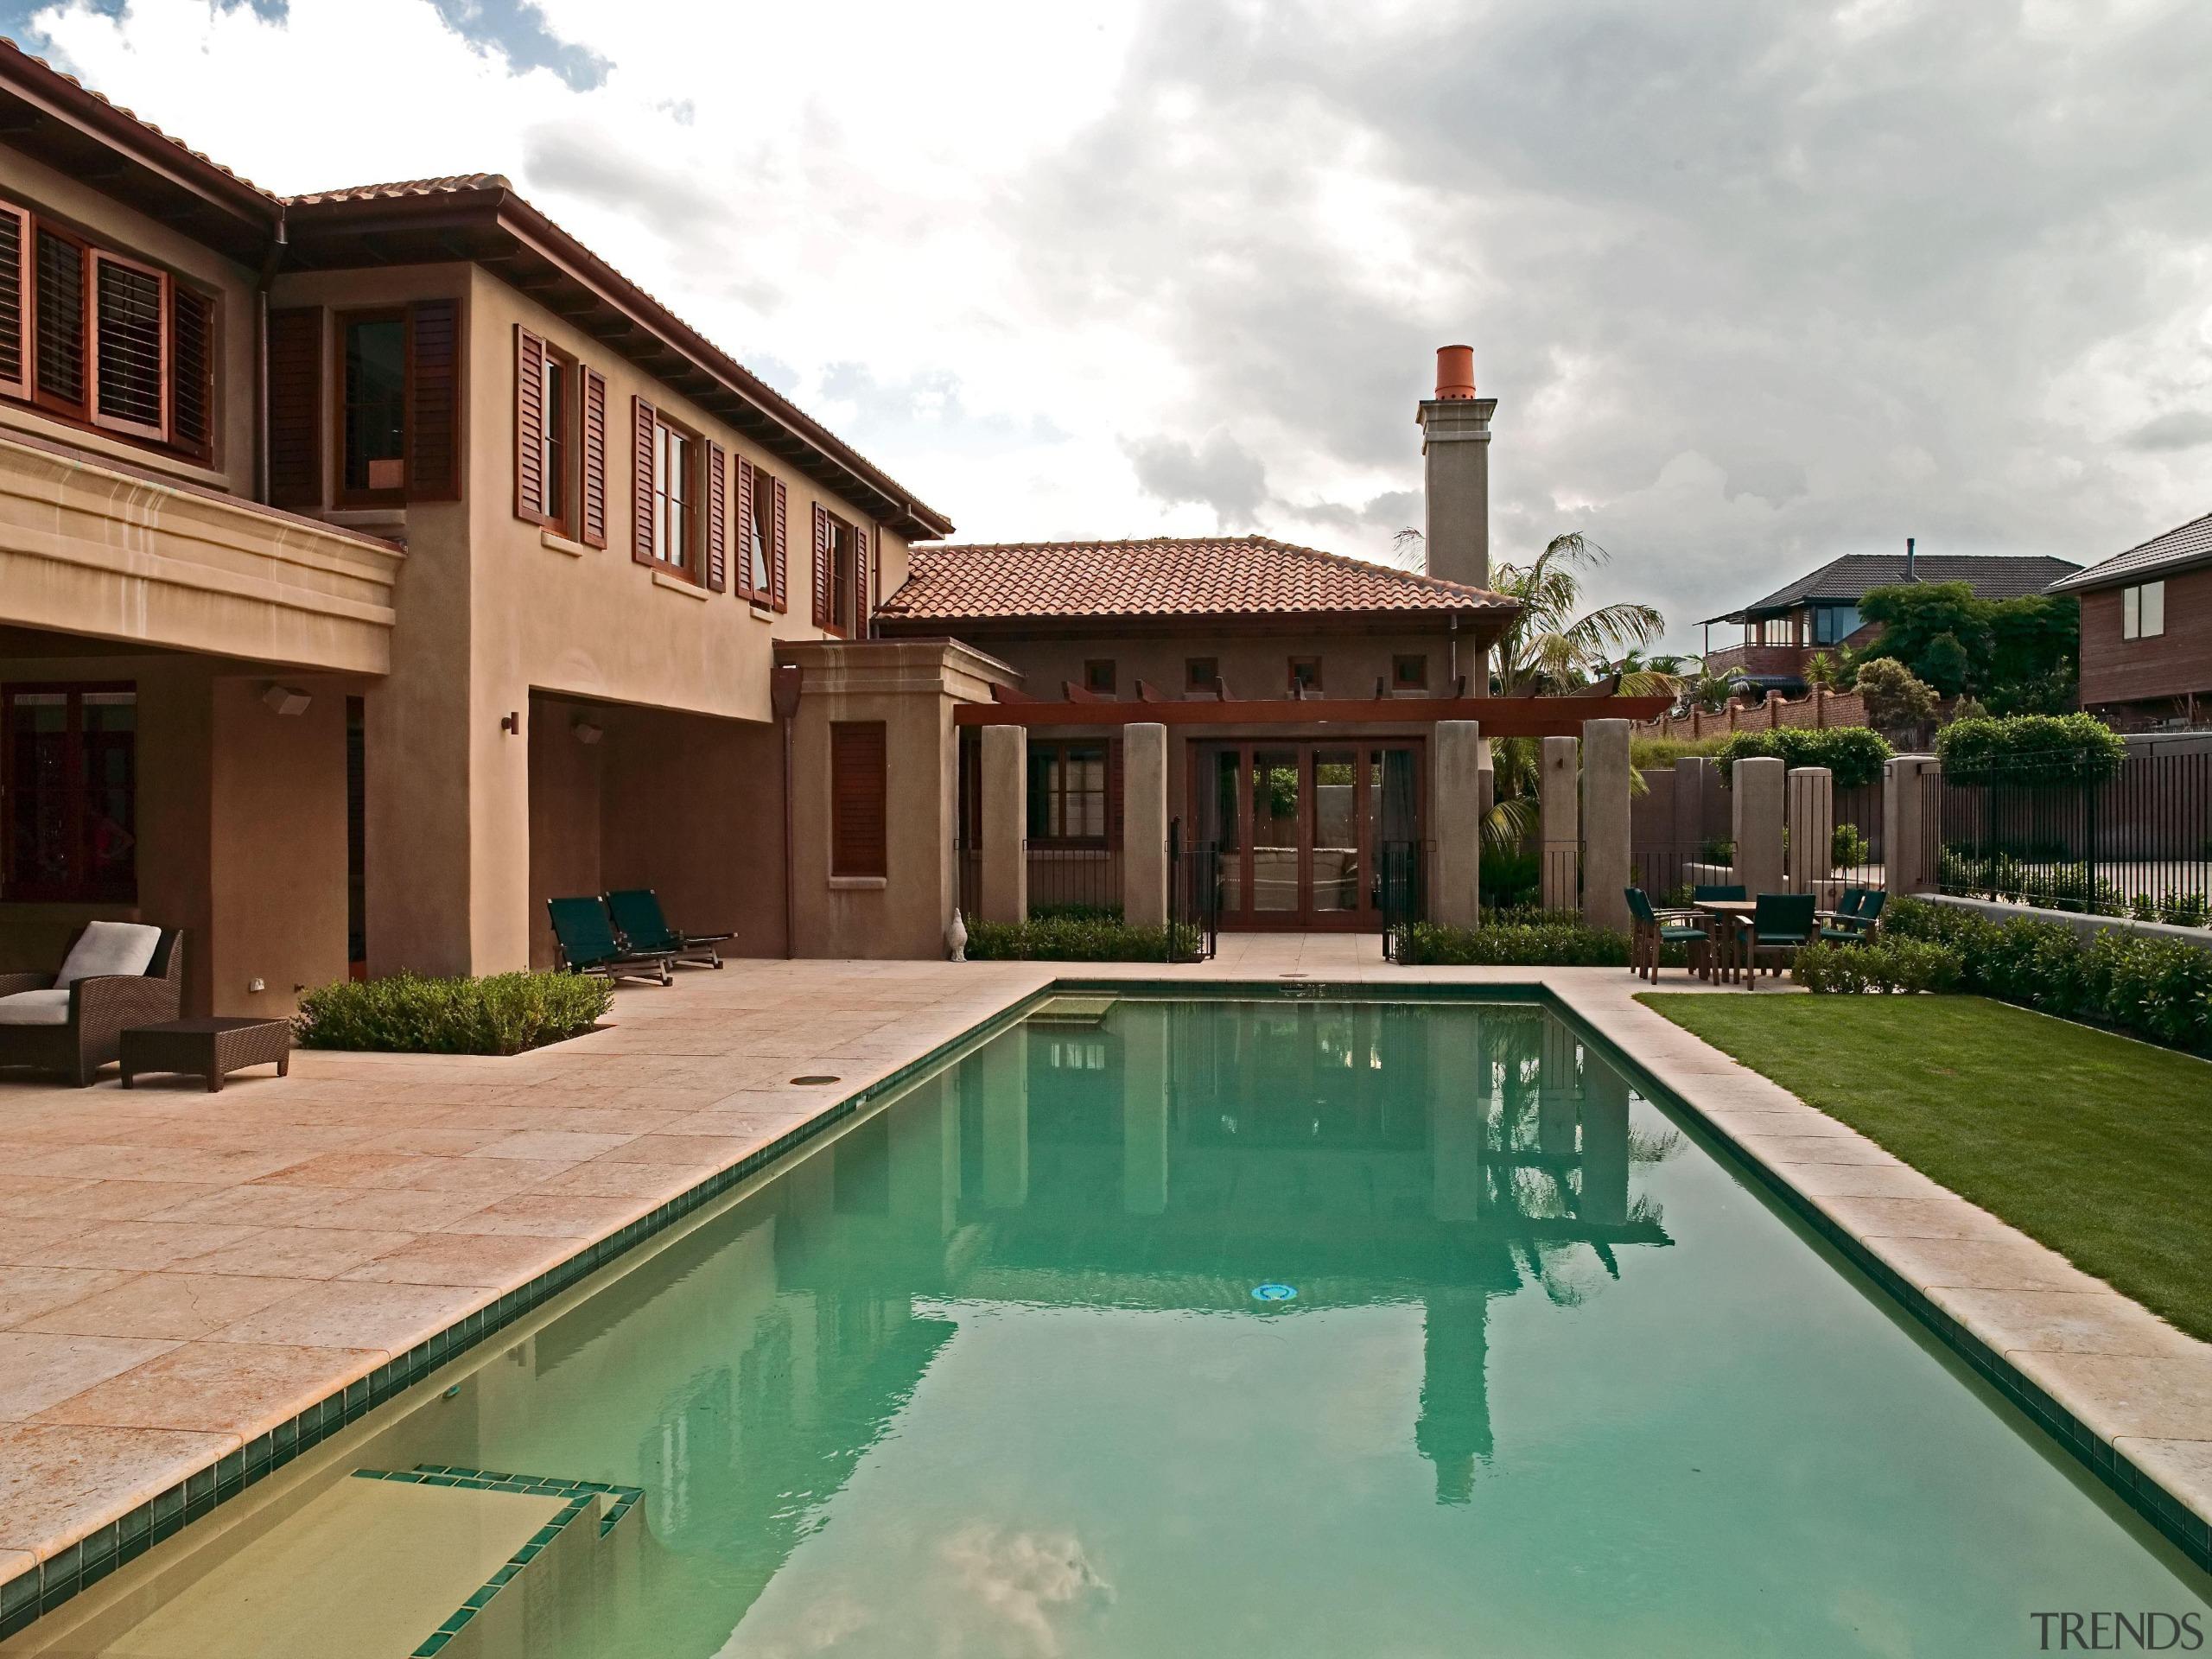 139 onetaunga pool - Onetaunga Pool - backyard backyard, estate, hacienda, home, house, mansion, property, real estate, residential area, swimming pool, villa